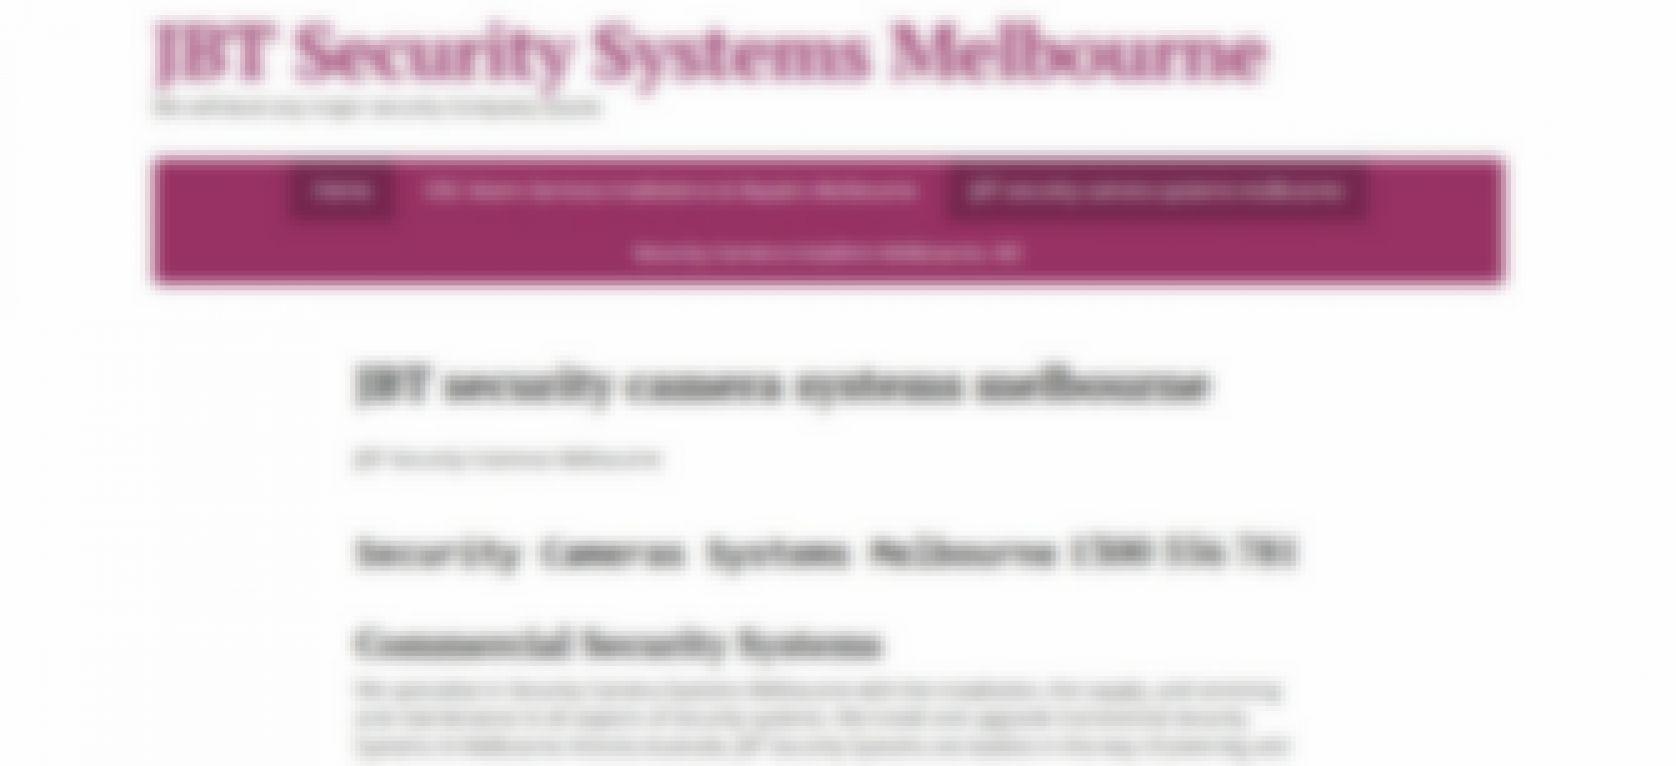 jbt security camera systems